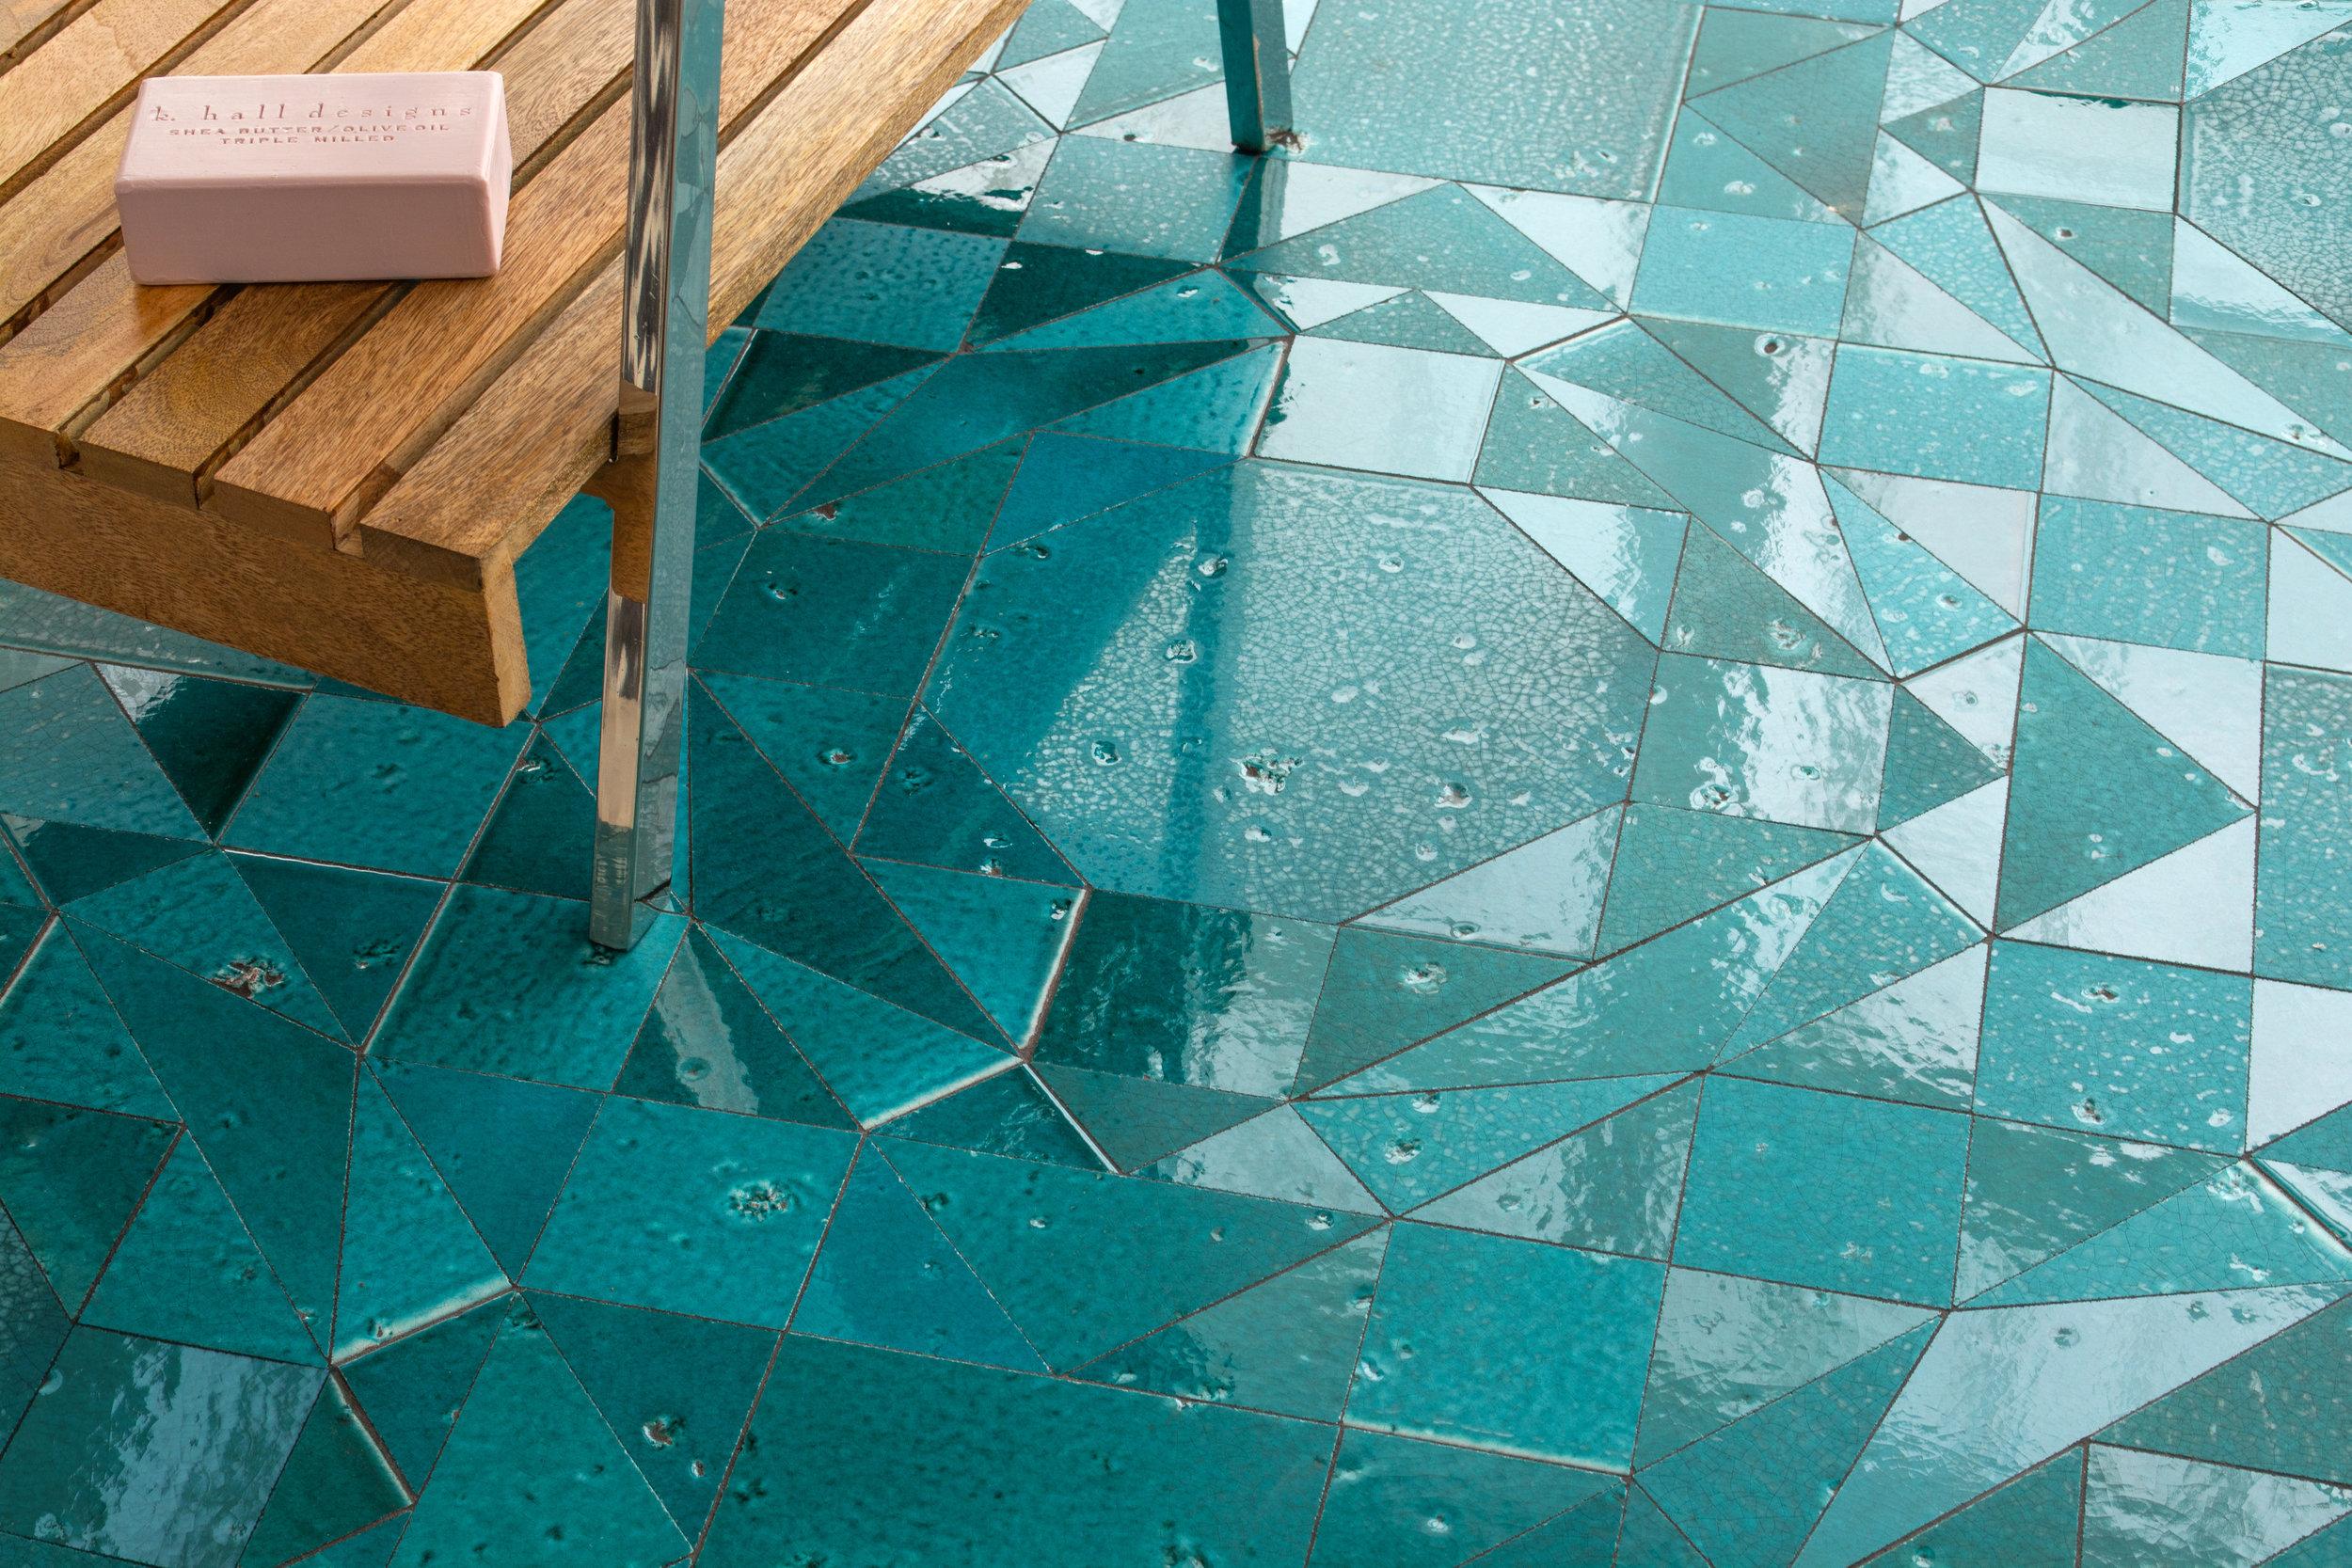 NR - NewRavenna - Bismarck Grand Aloe - Mosaic - Flooring.jpg